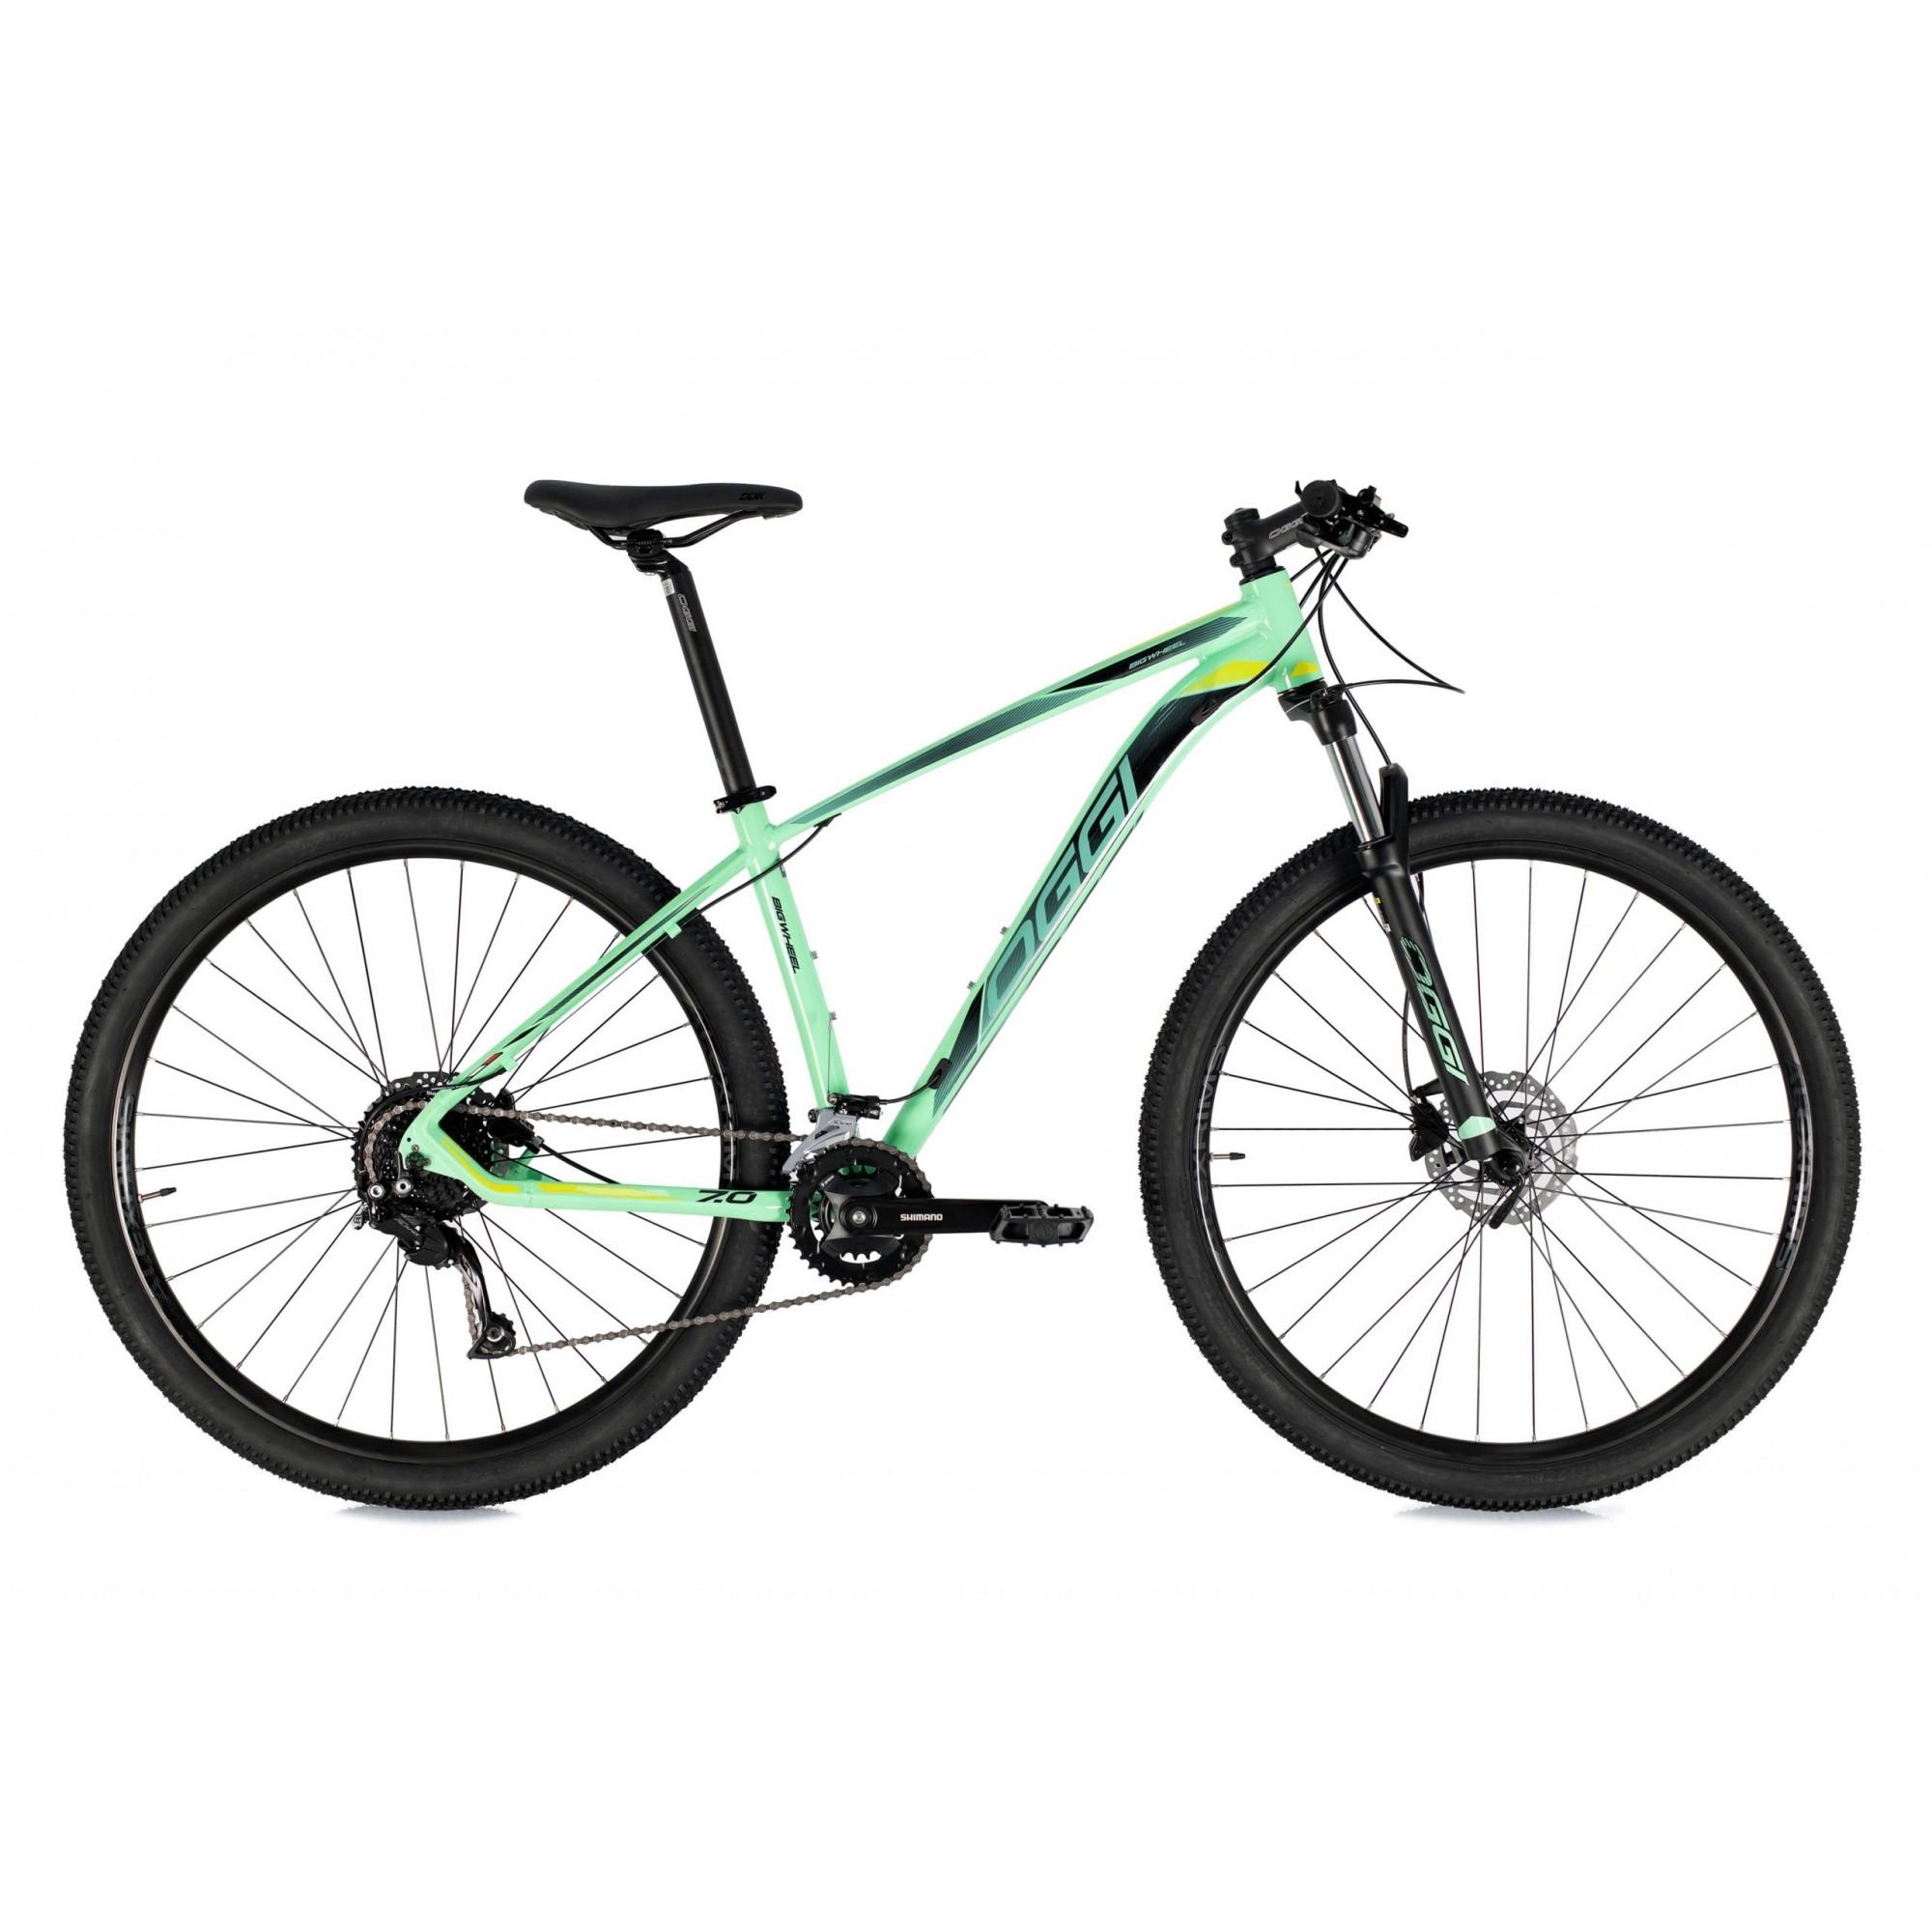 Bicicleta OGGI 7.0 aro 29 2021 - 18V Shimano Alivio - Freio Shimano Hidráulico - Verde/Preto/Slime